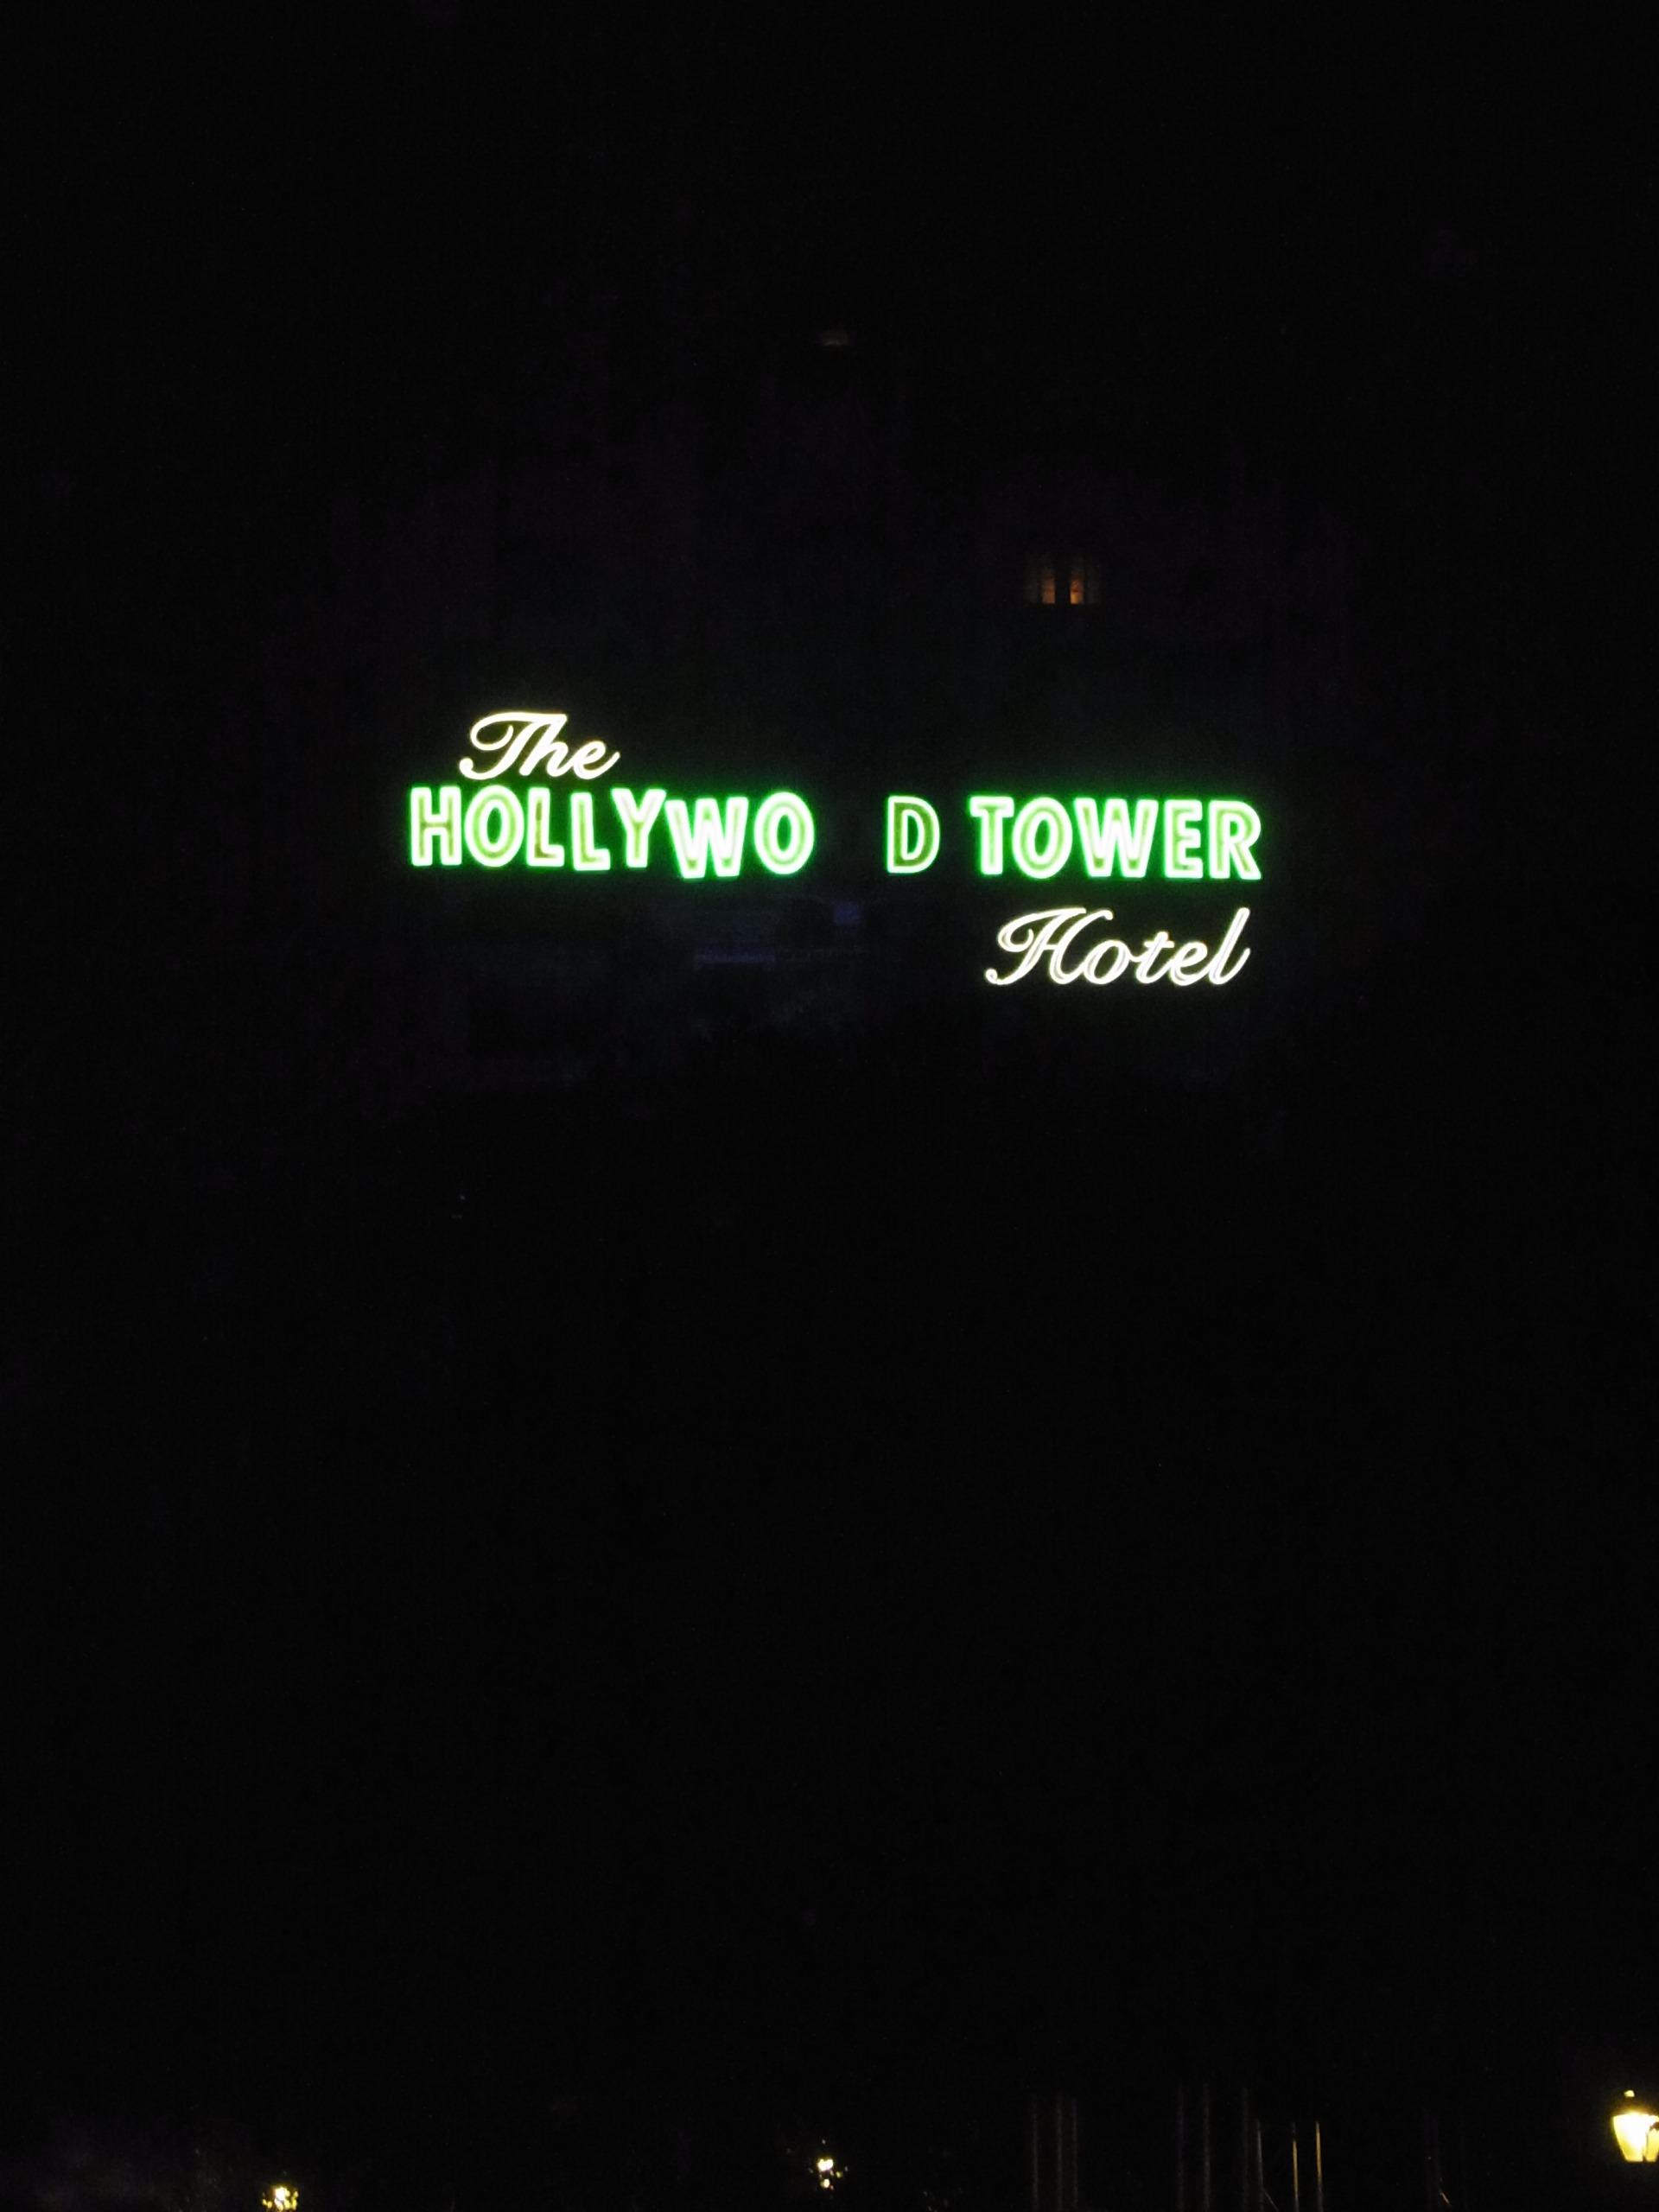 WDW旅行記 58 グレート・ムービーライドで映画のワンシーンに